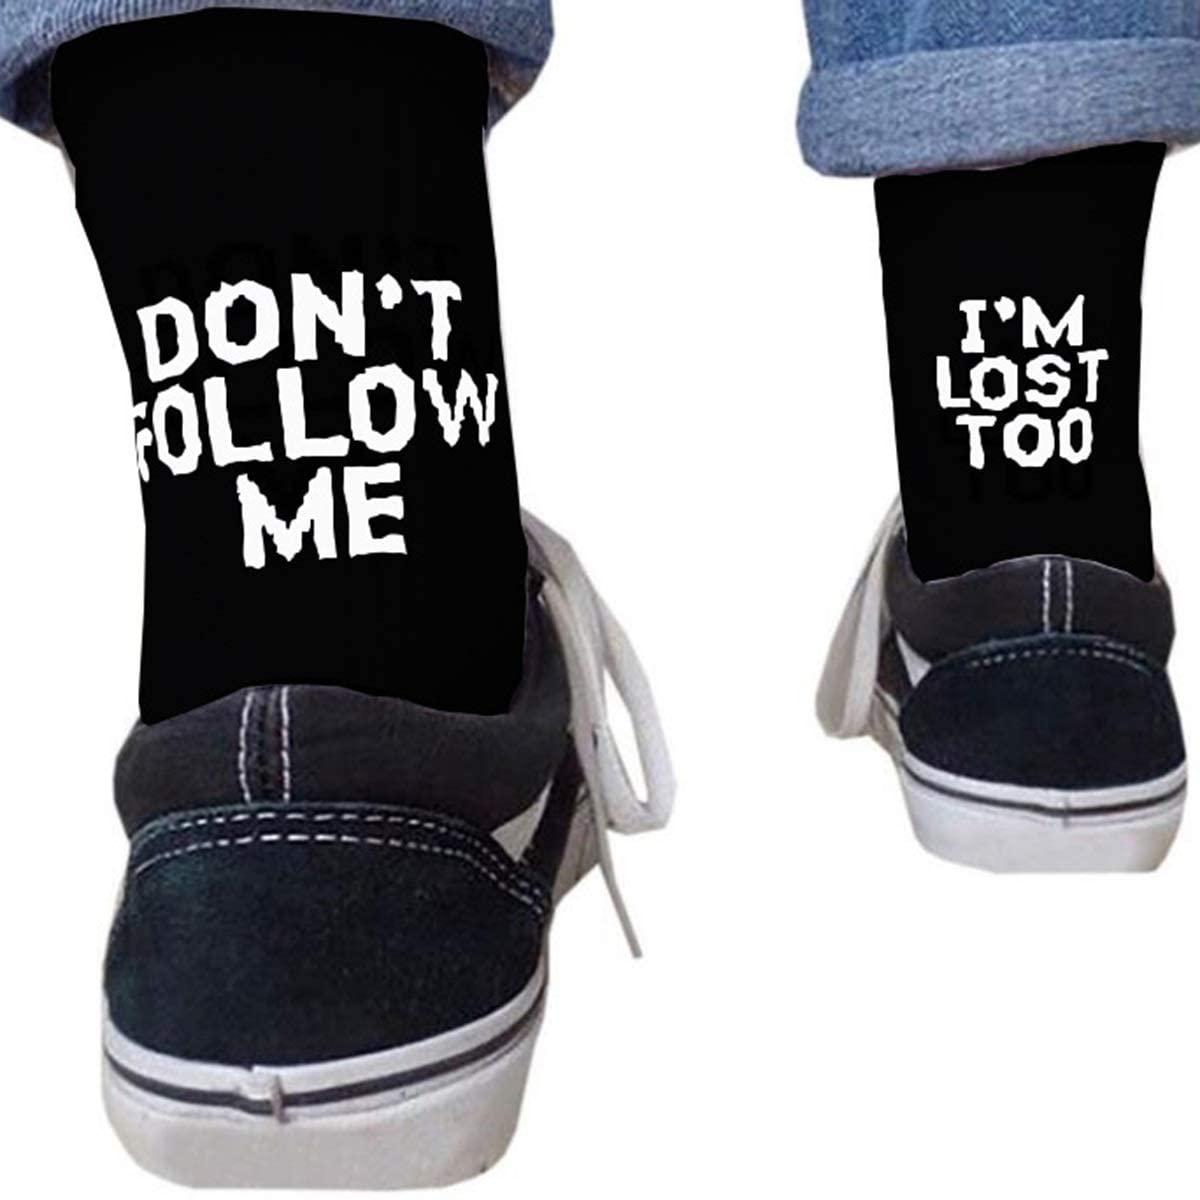 Funny Socks Don't Follow ME I'm Lost Too Letter Print Art Skateboard Soft Fashion Socks (Color : Black)